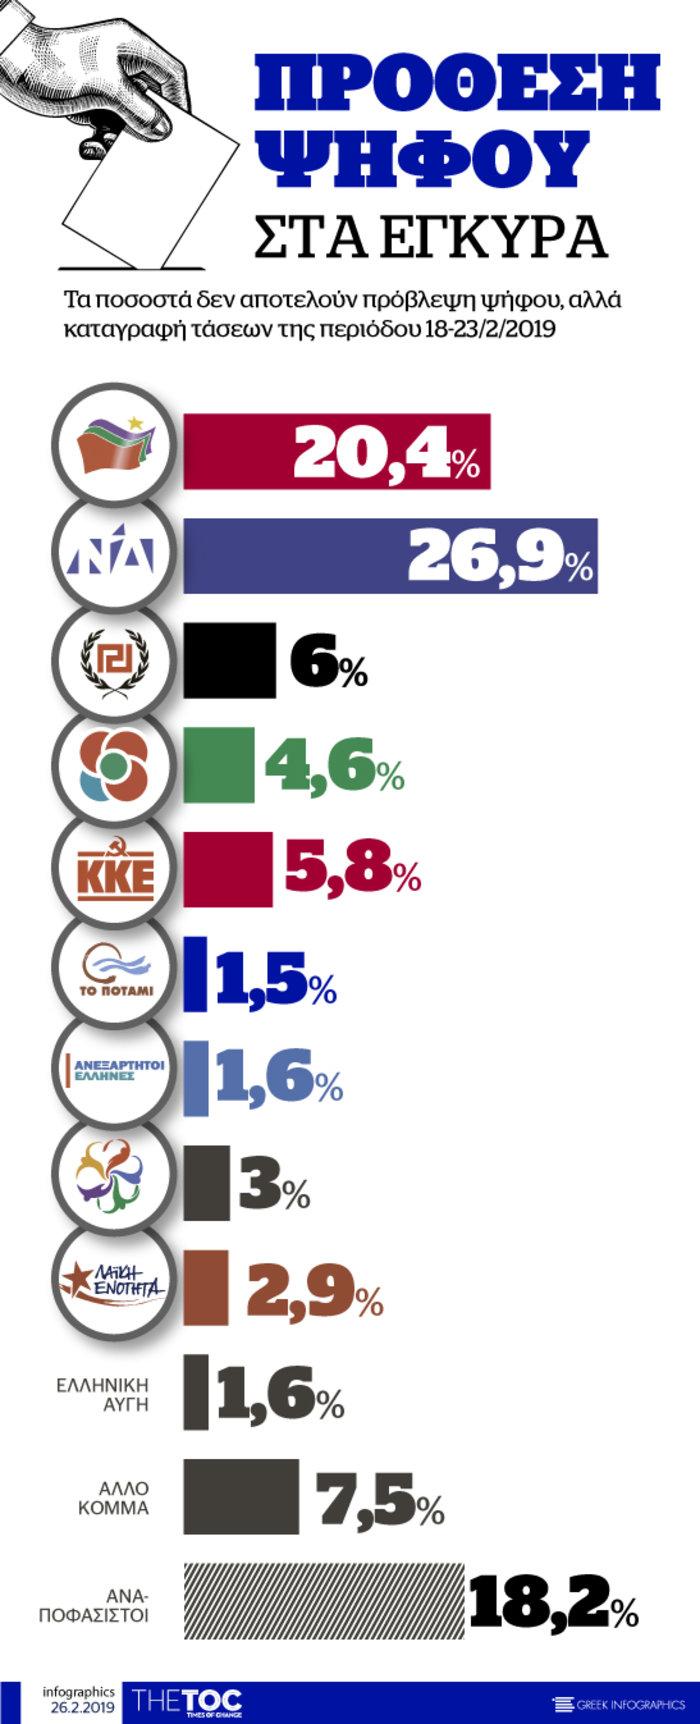 Infographic: Πάνος Κωνσταντόπουλος